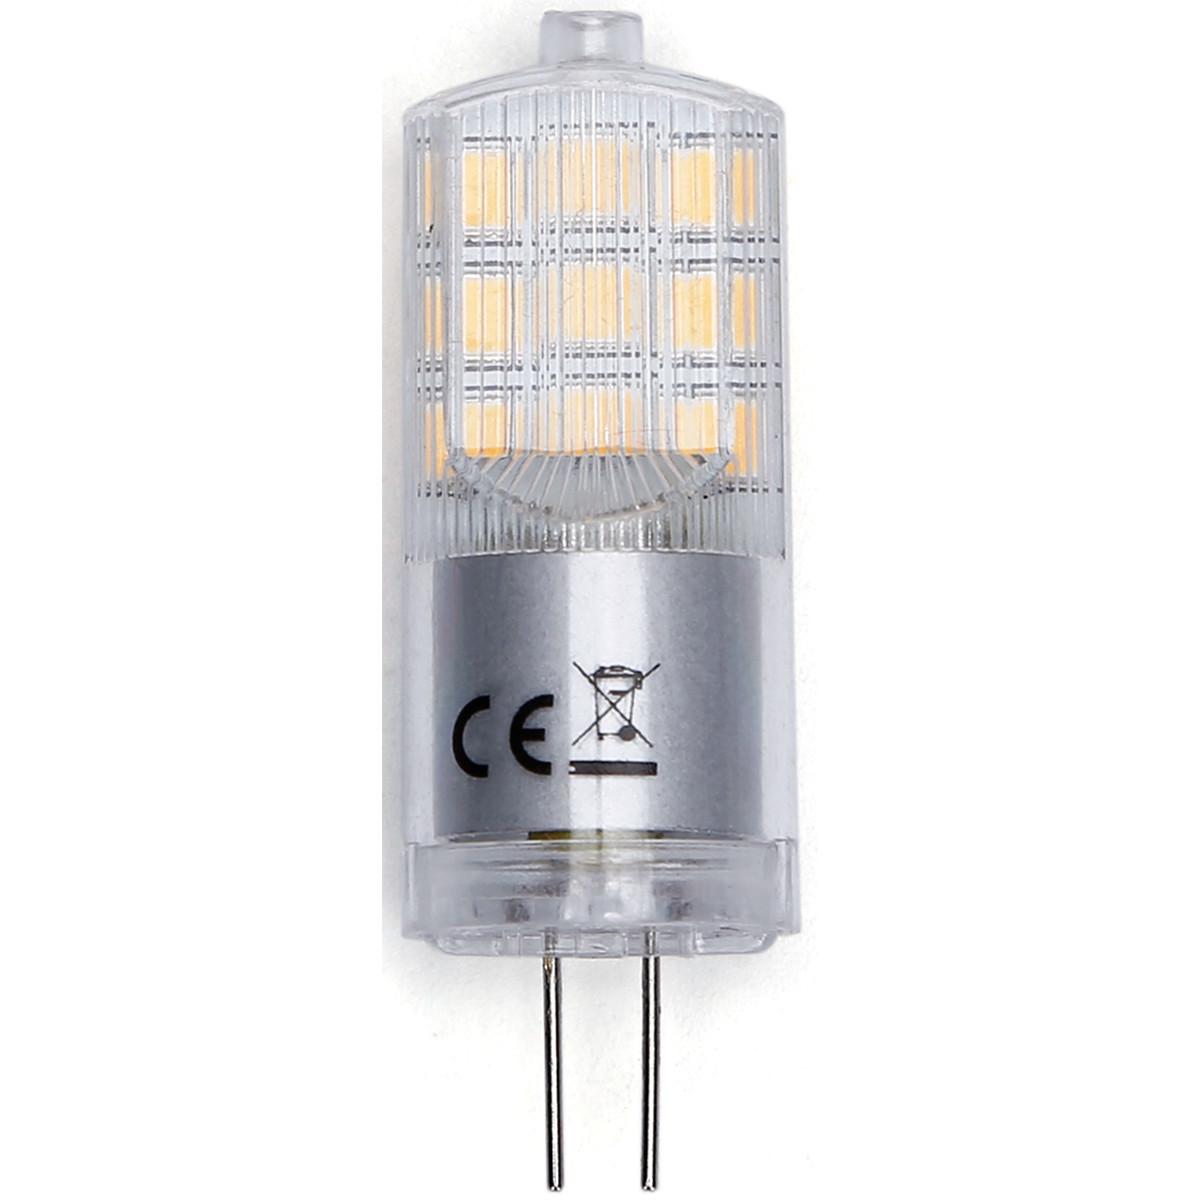 LED Lamp - Aigi - G4 Fitting - 3W - Warm Wit 3000K | Vervangt 25W